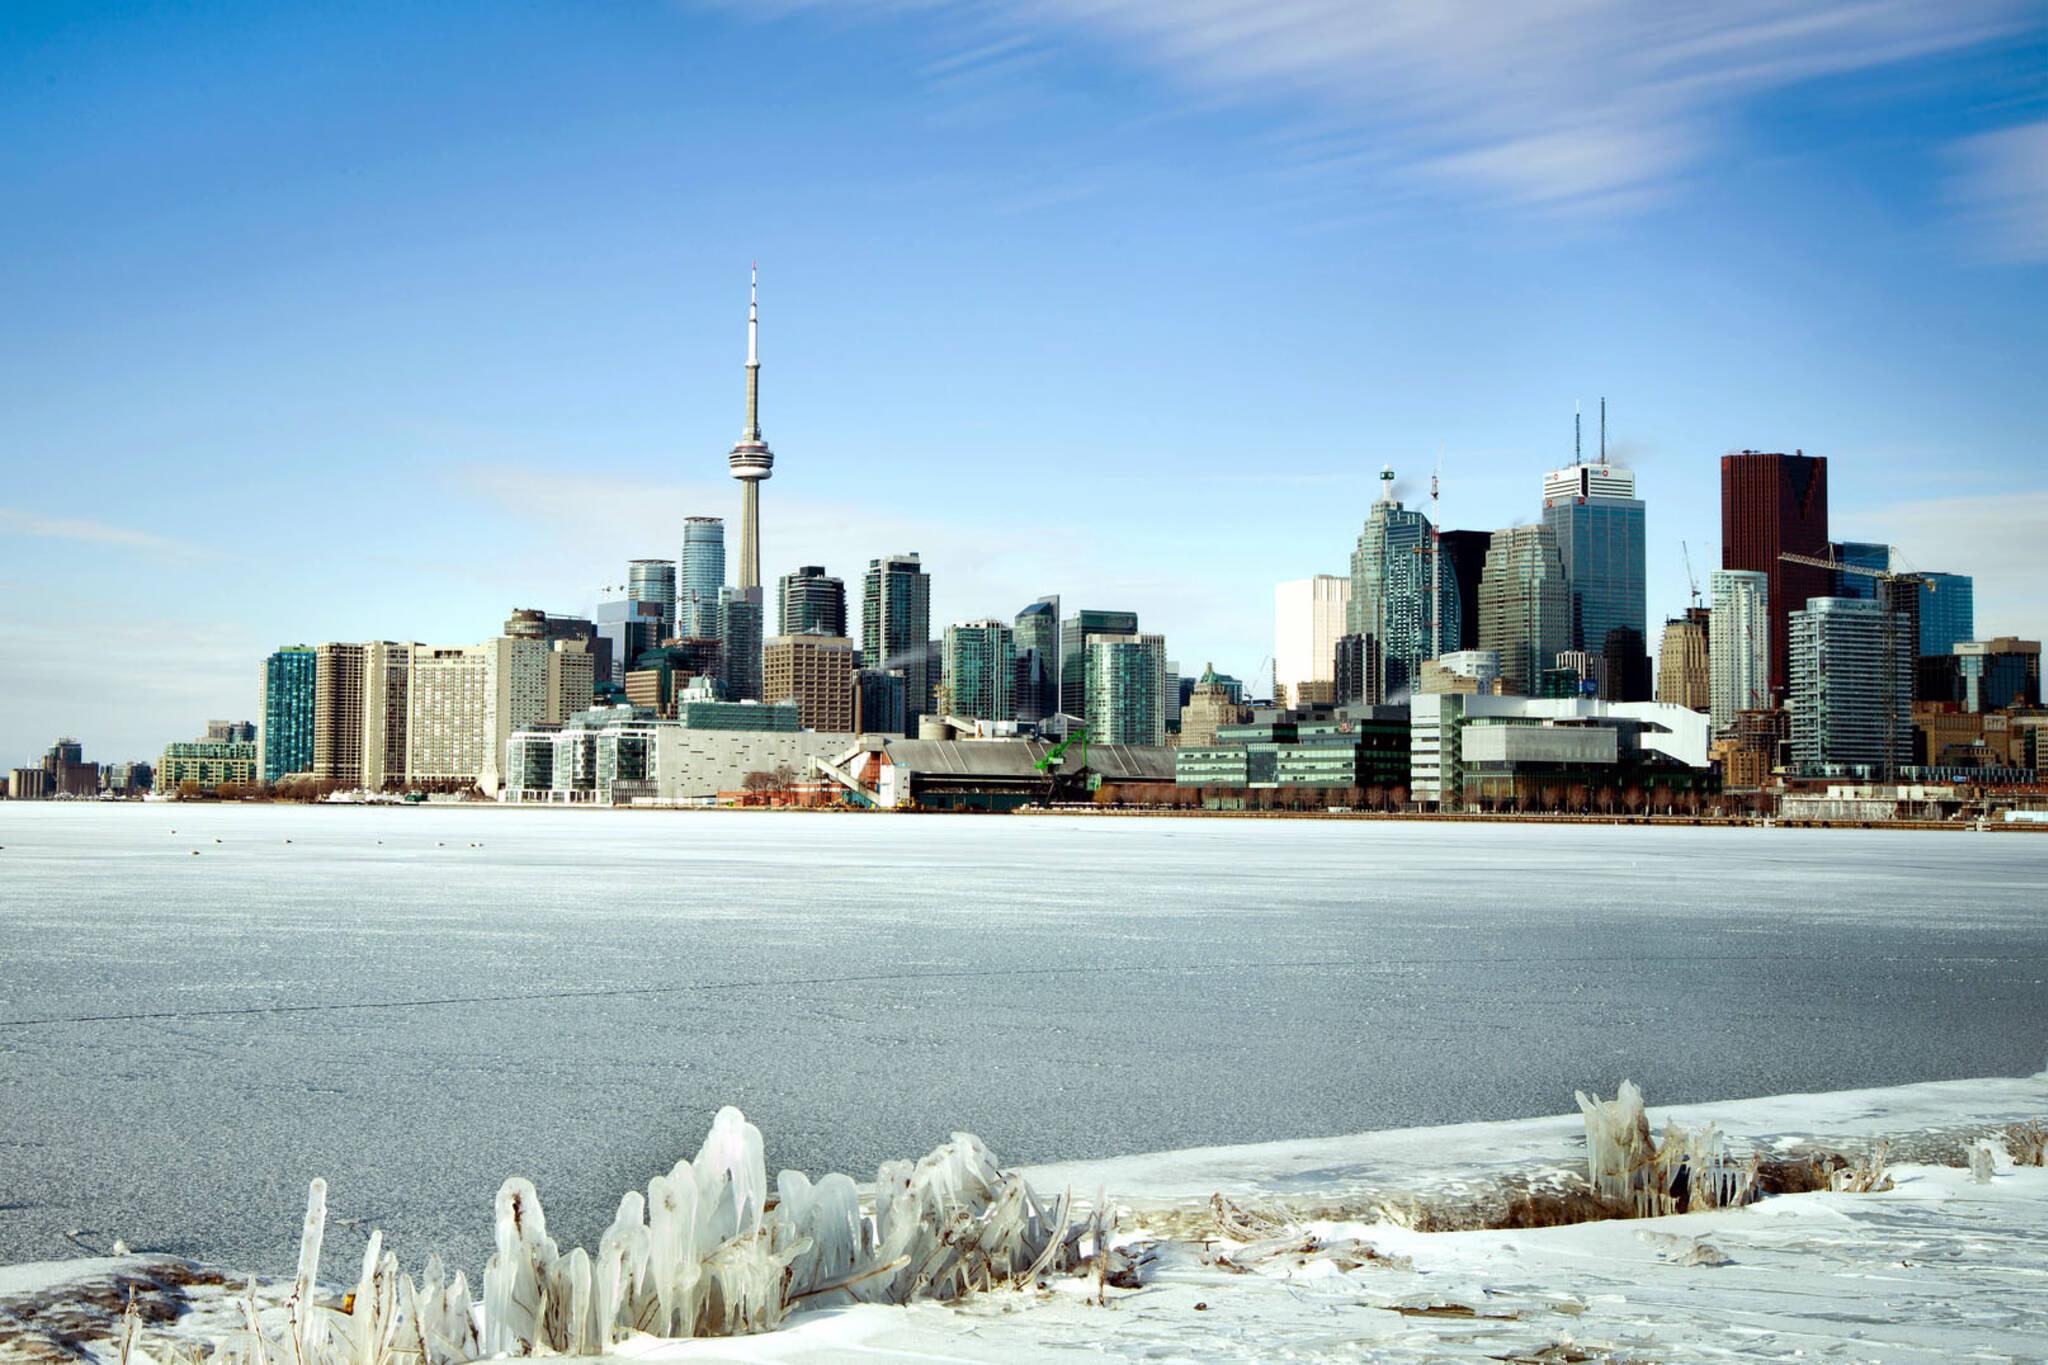 Toronto,cold,alert